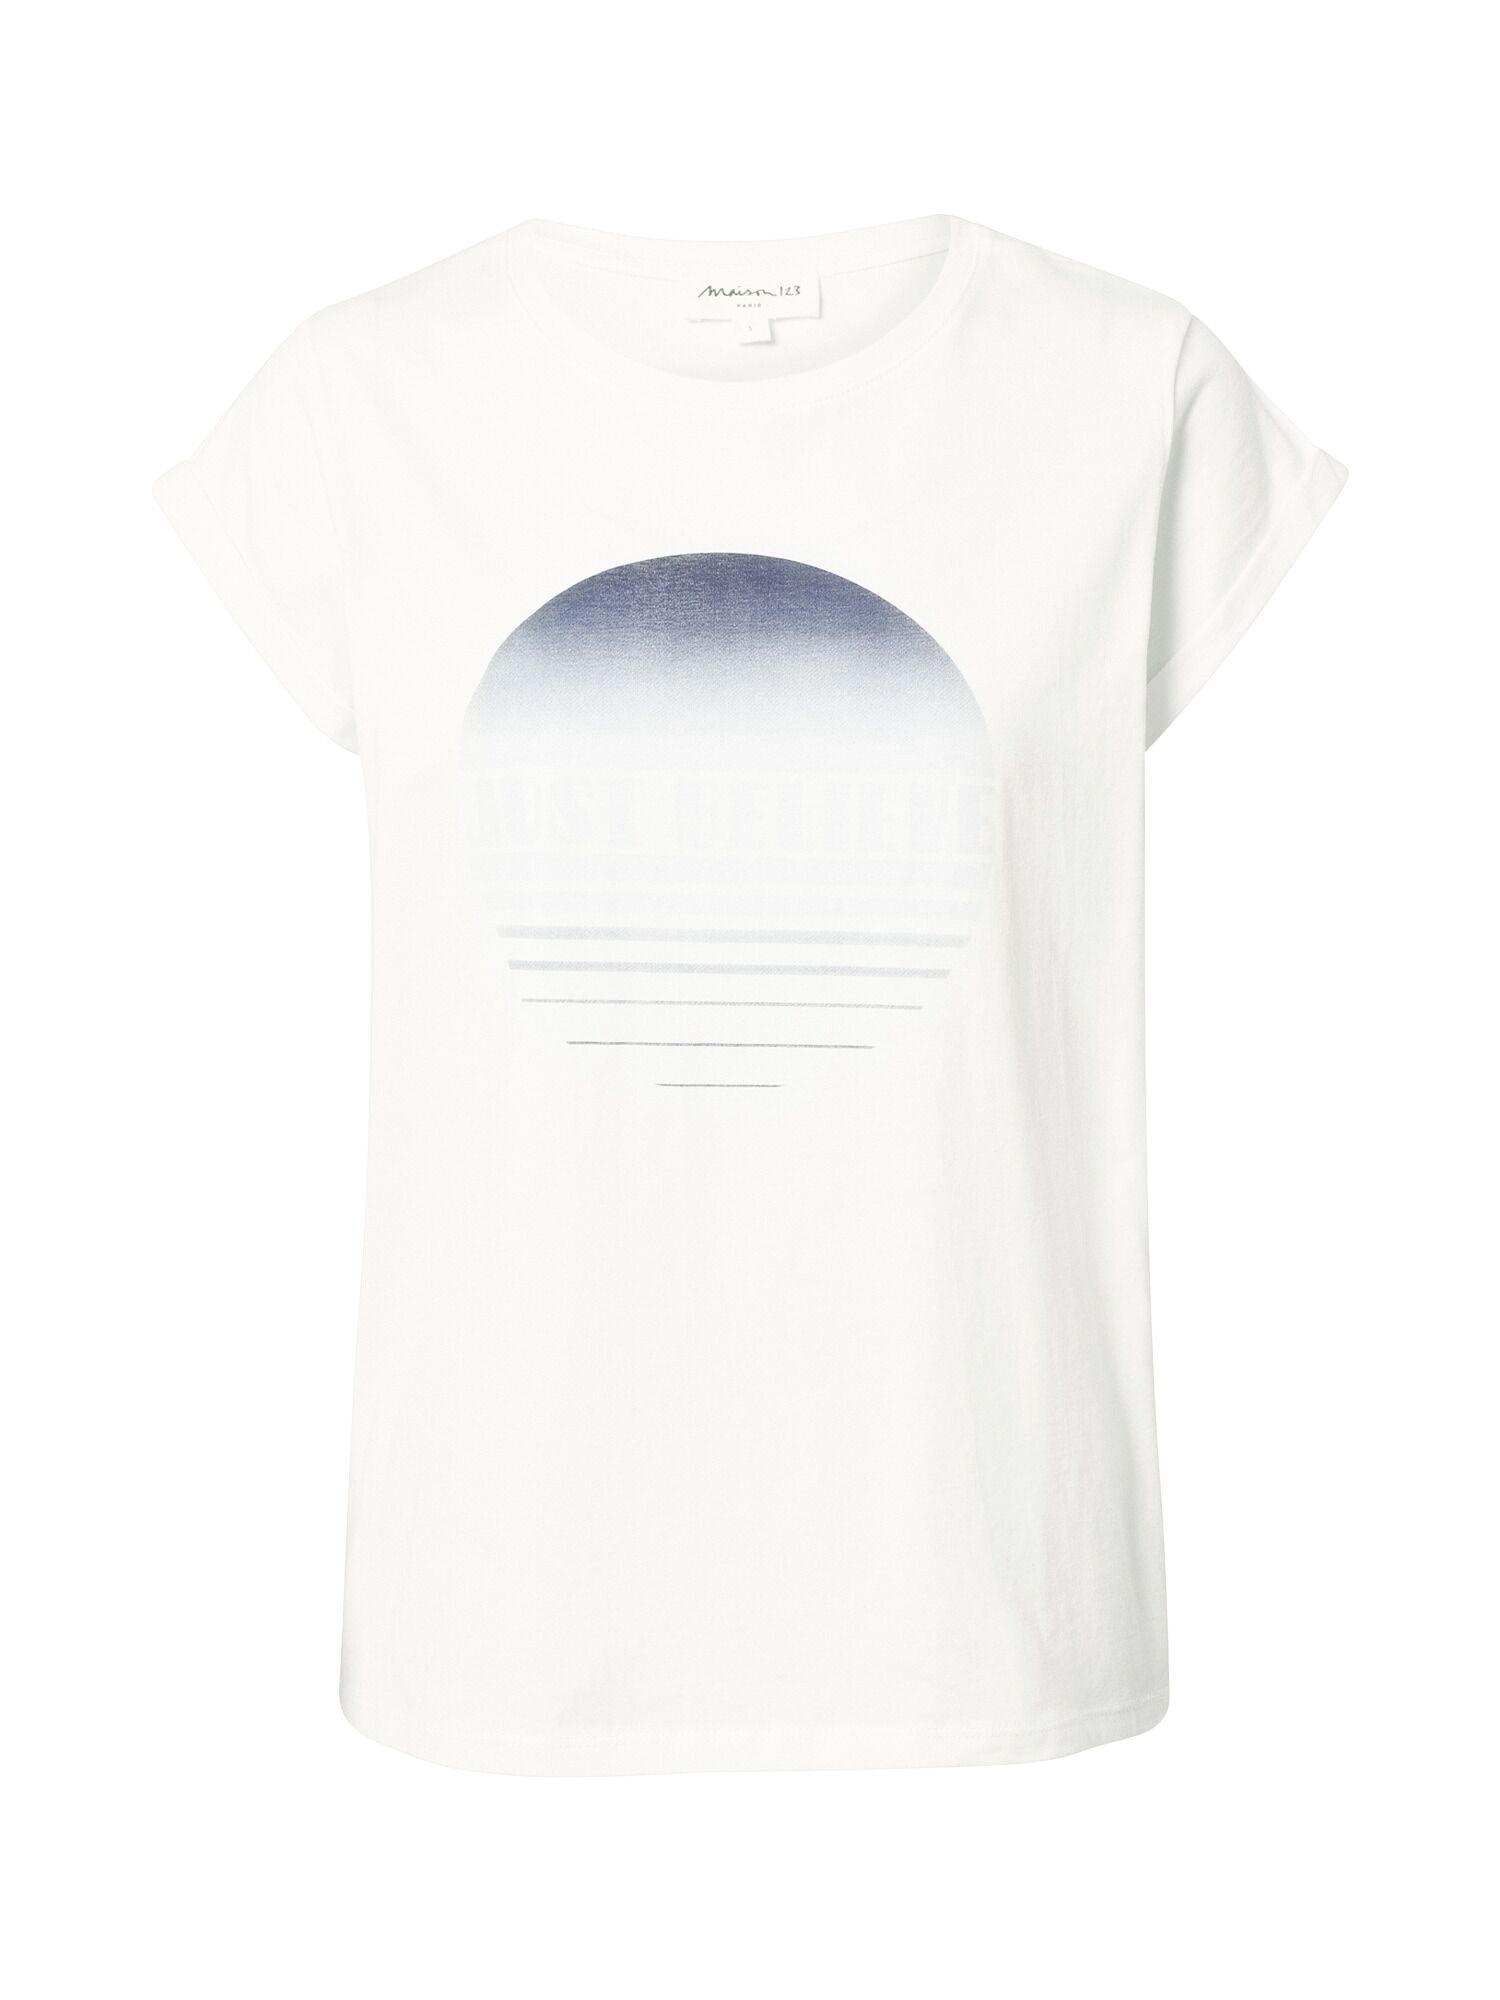 Maison 123 T-shirt 'INNOCENT'  - Beige - Taille: M - female